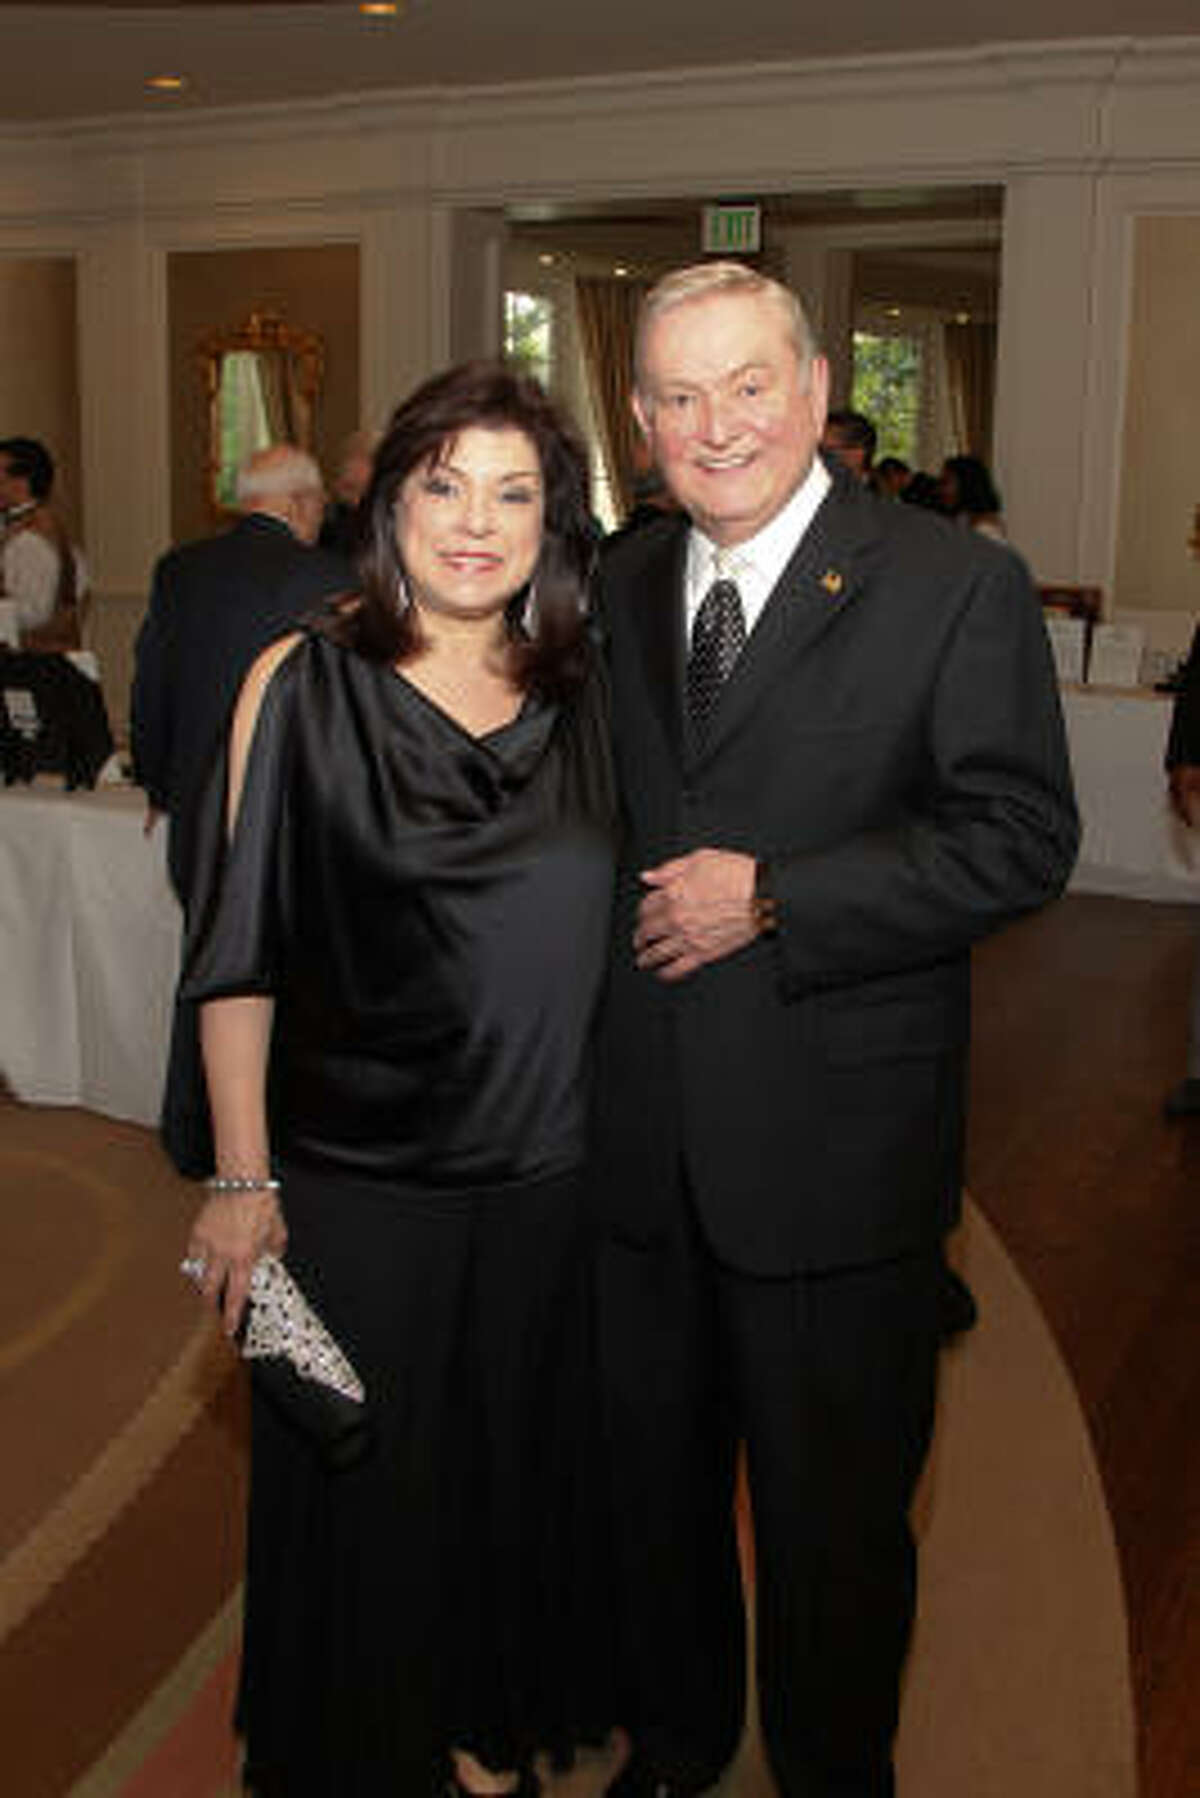 Honorees Laura and Dave Ward